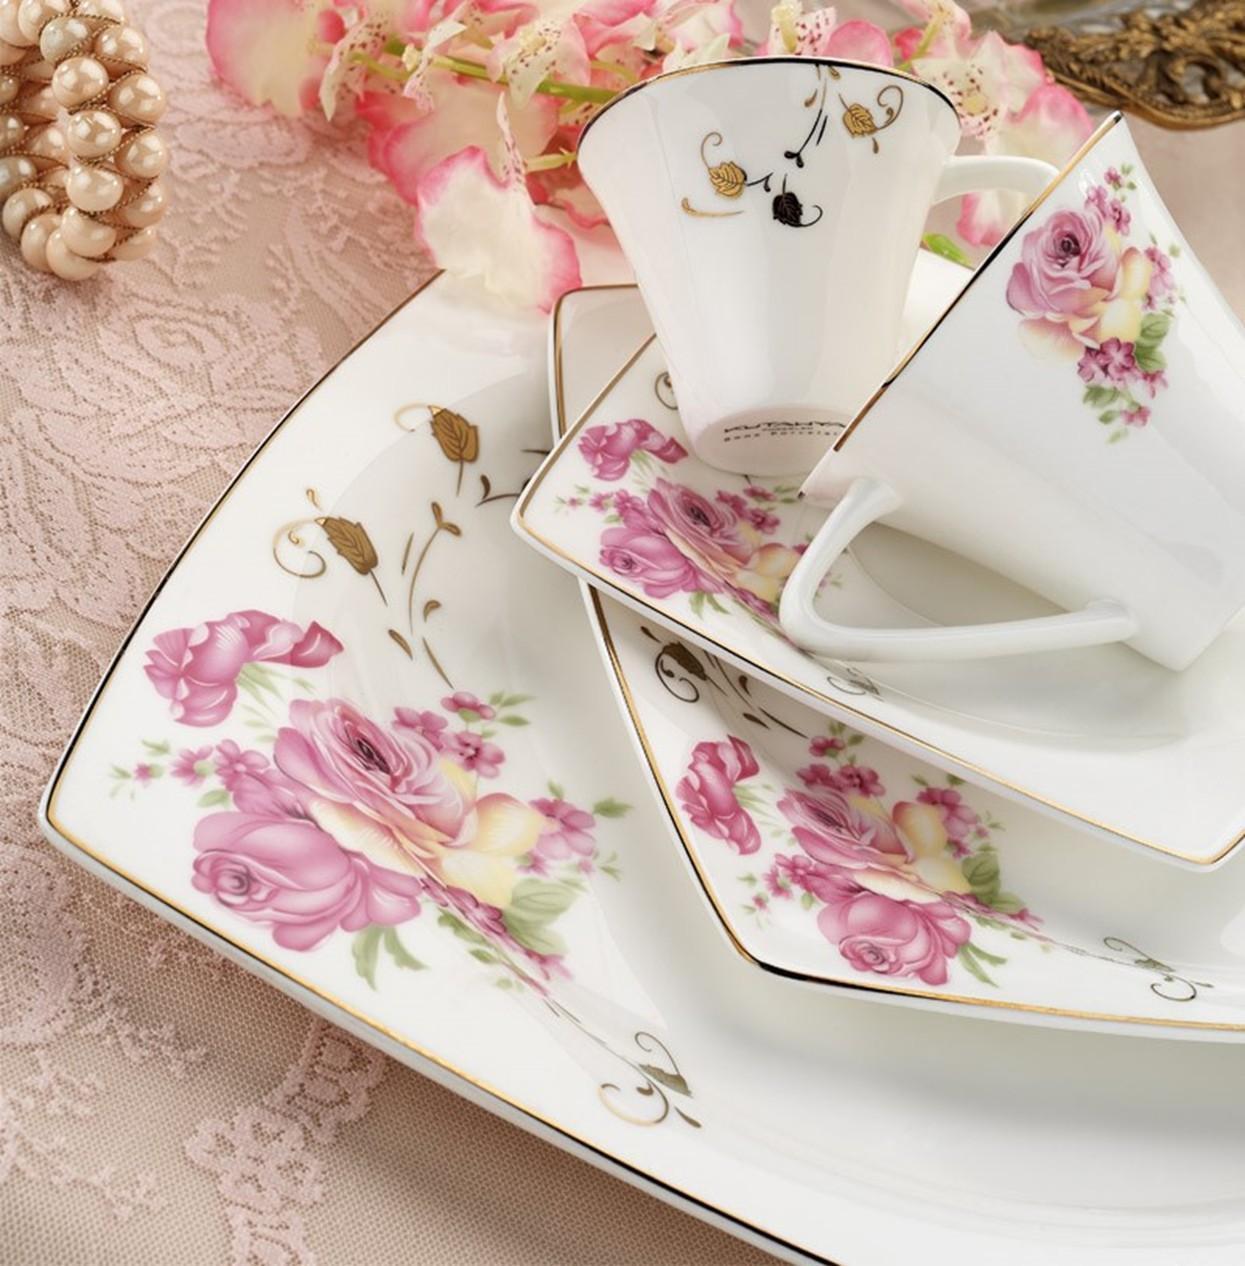 Kutahya Porselen KARE BONE 83 Pieces 65113 Patterned Dinnerware Set